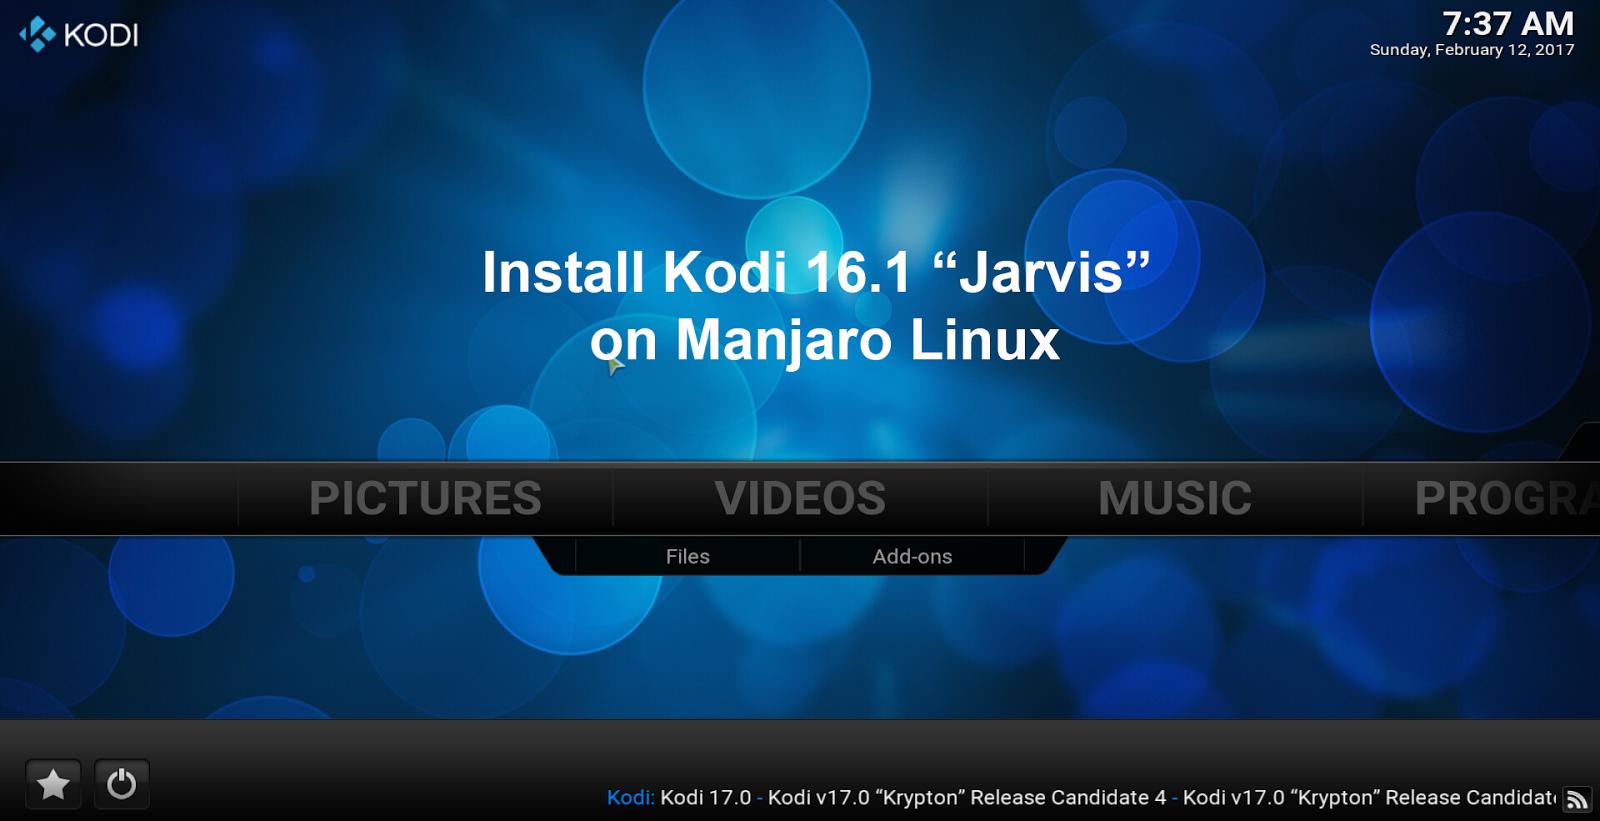 where to download kodi 16.1